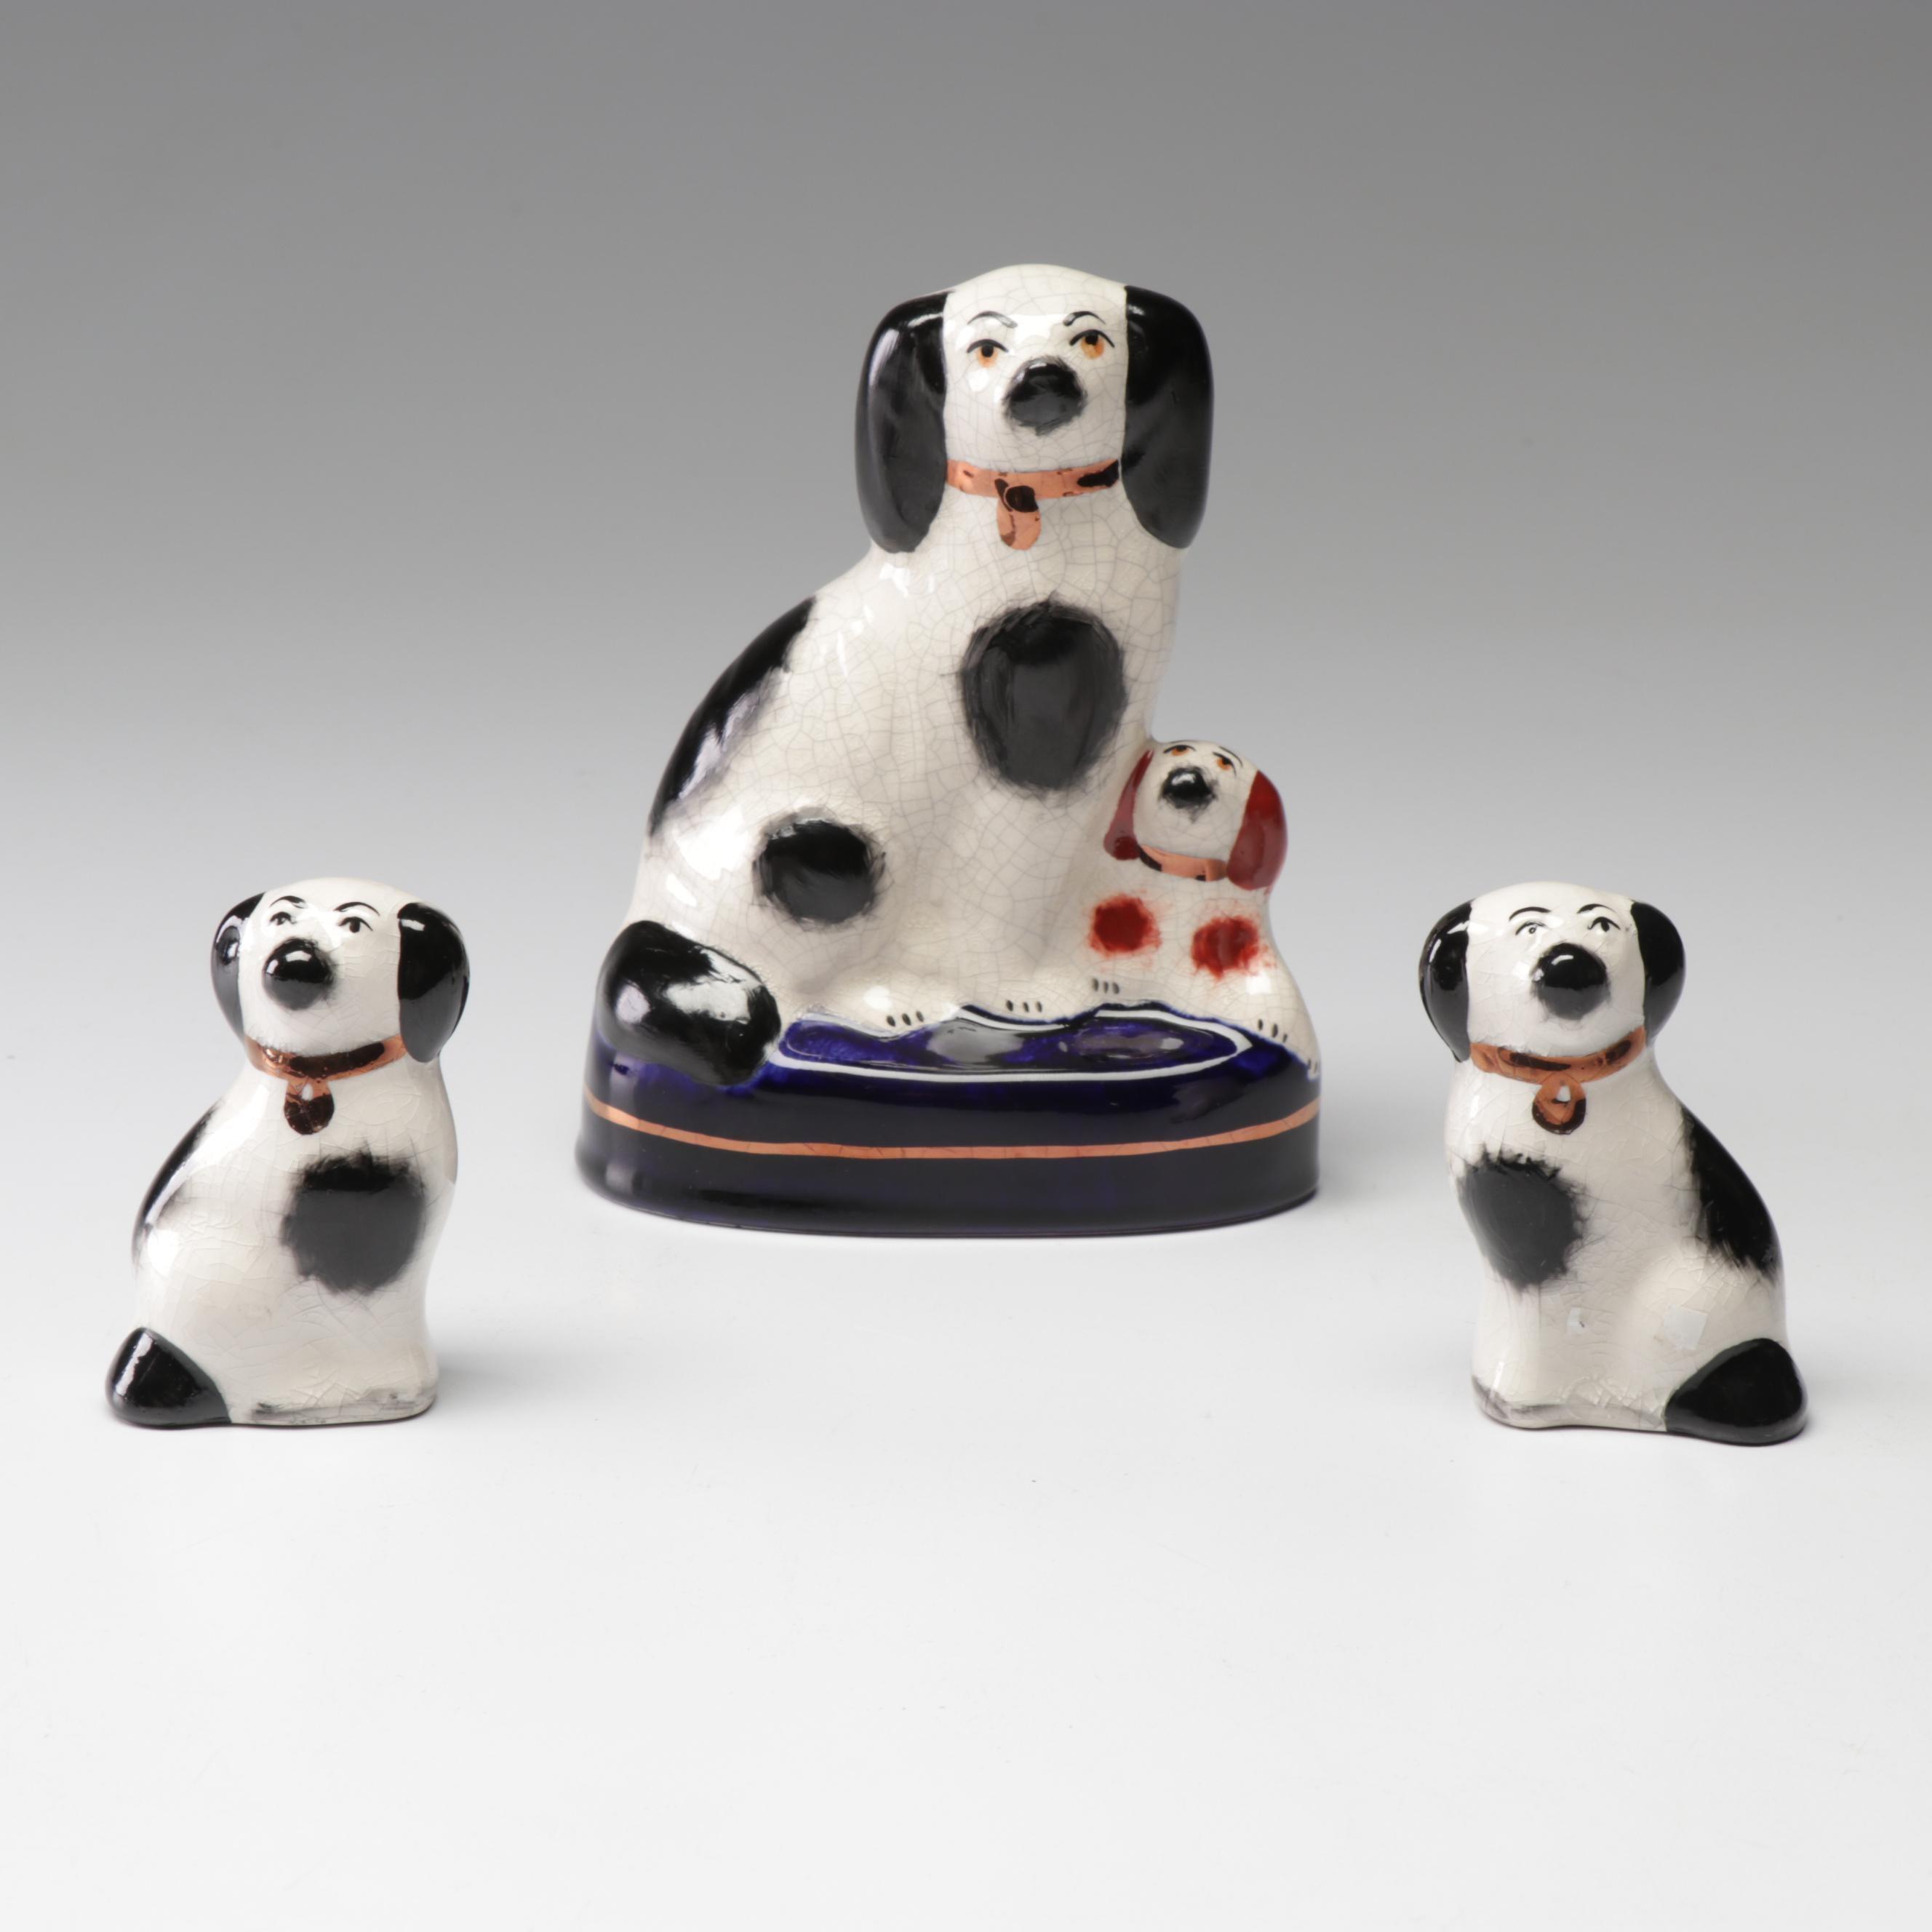 Staffordshire Ware Ceramic Cavalier King Charles Spaniels